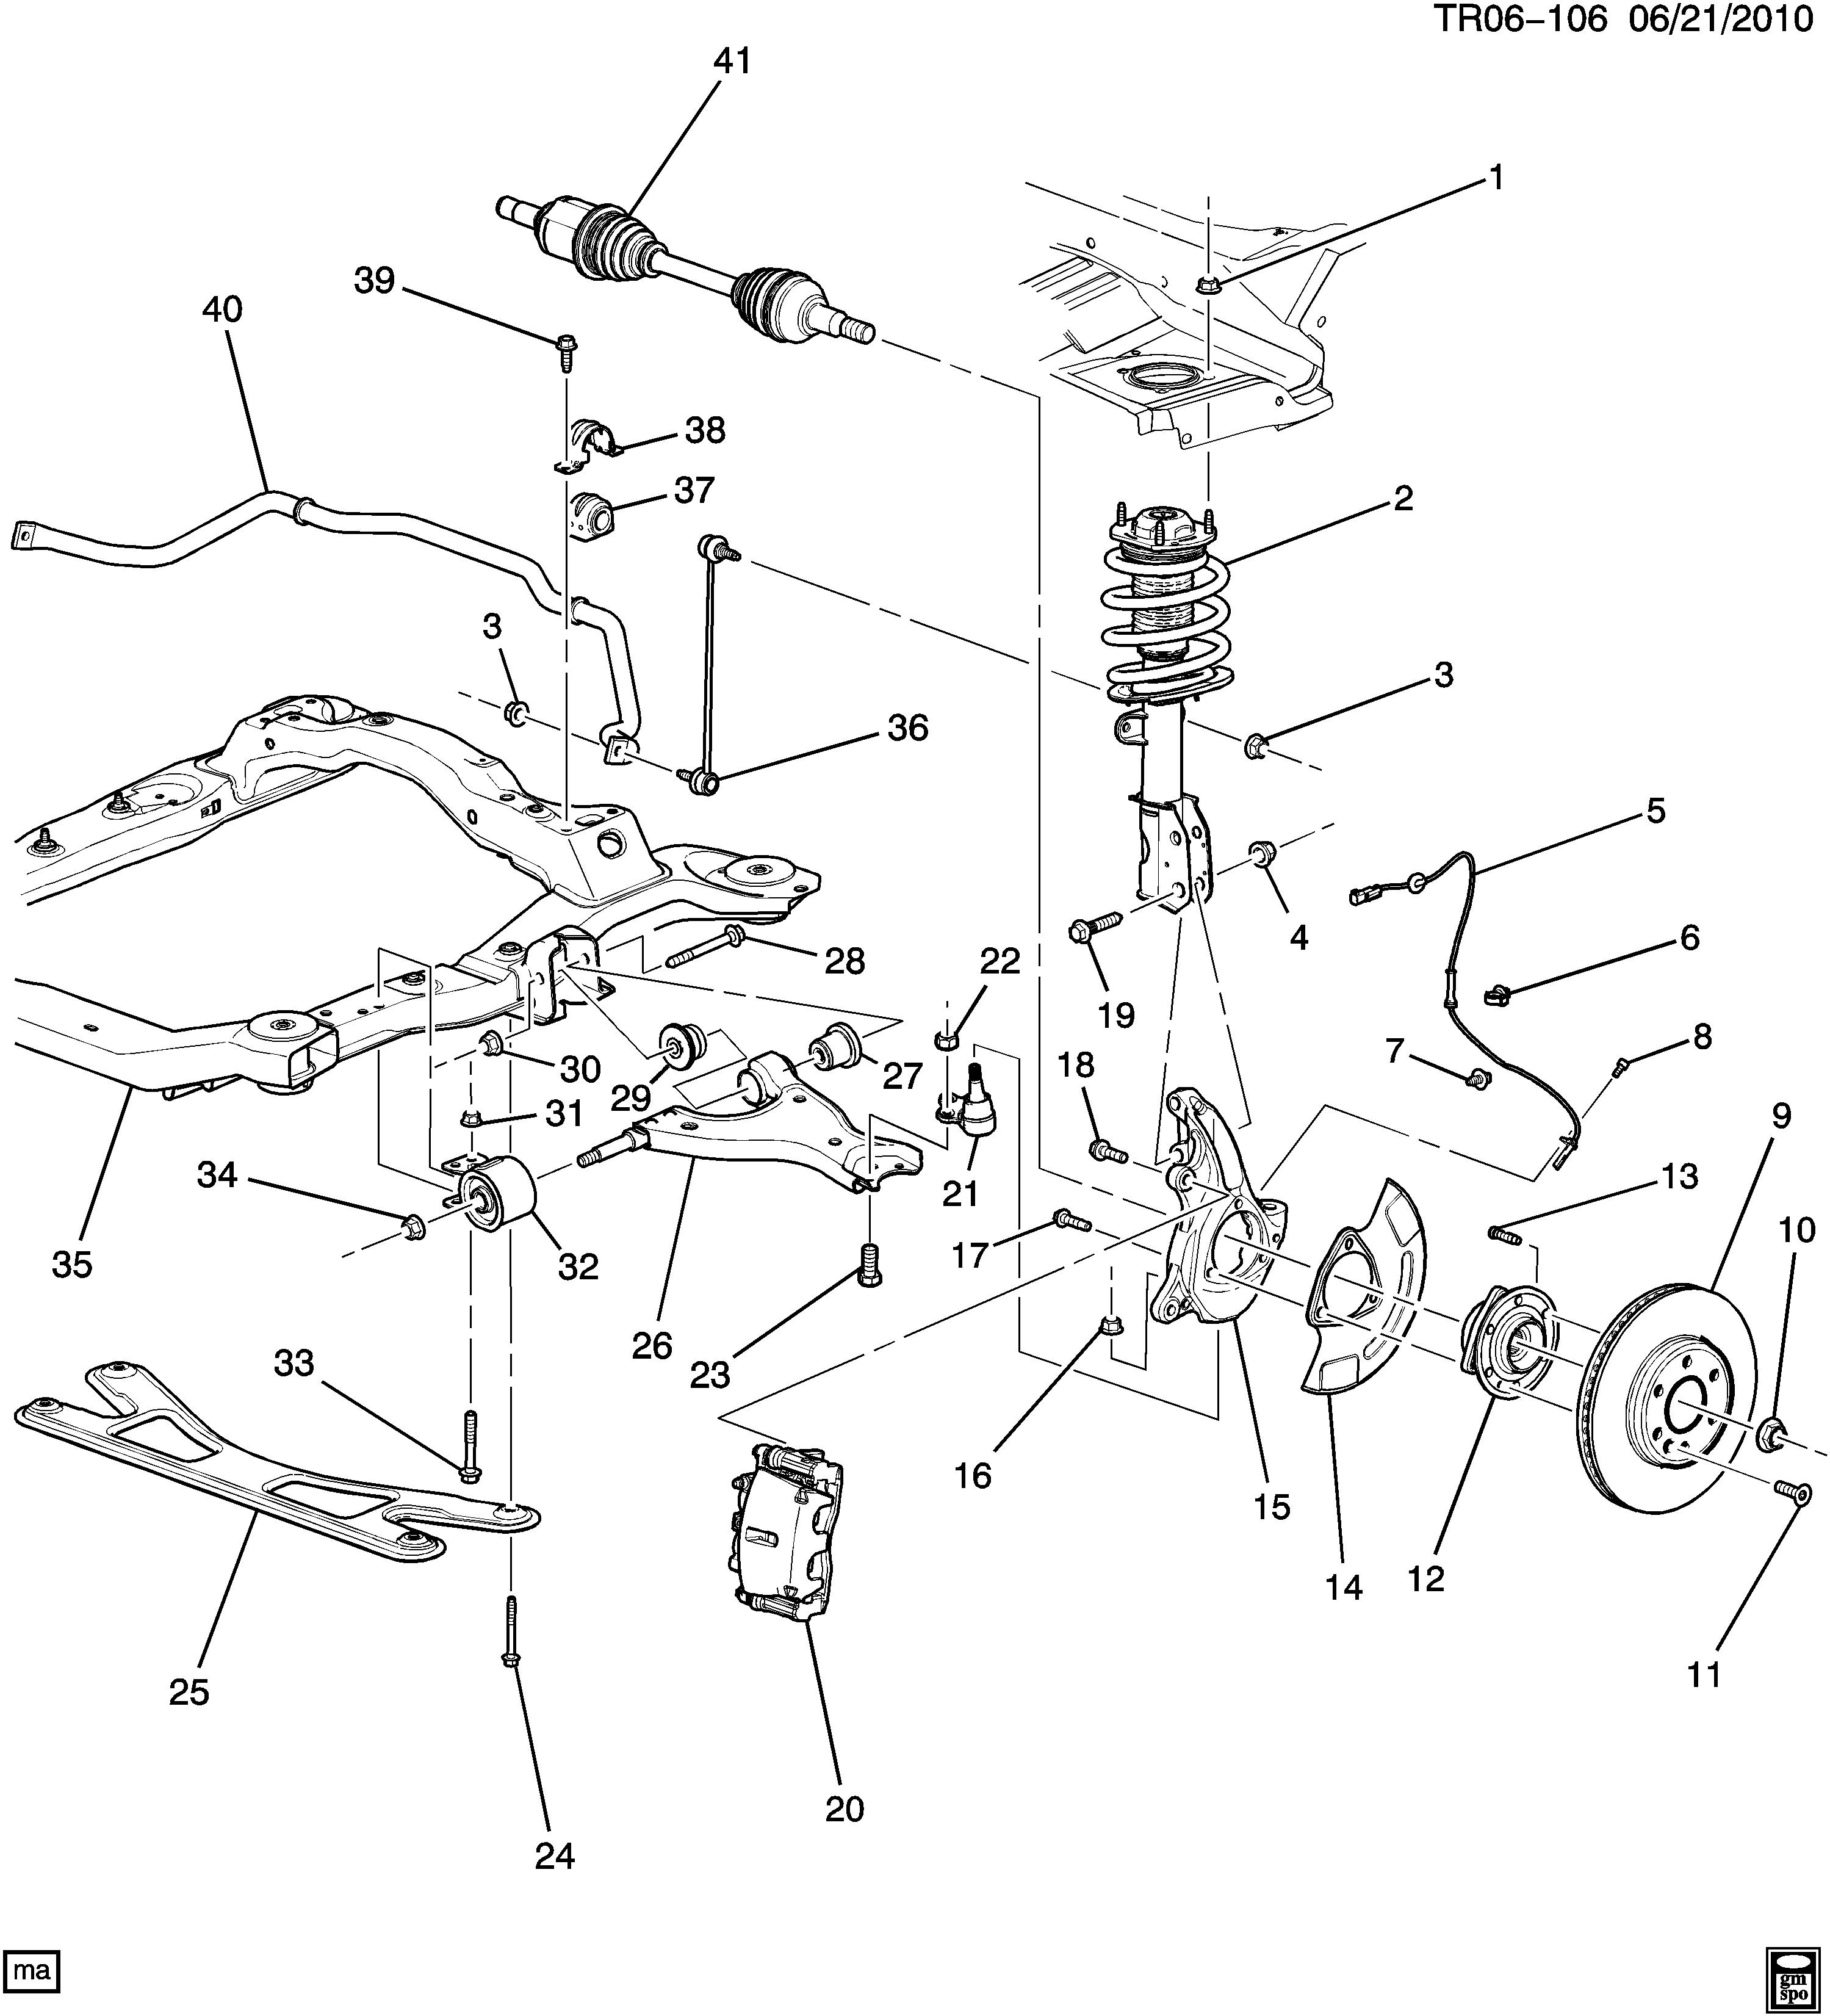 gmc acadia suspension diagram - wiring diagram desc rich-a -  rich-a.fmirto.it  fmirto.it